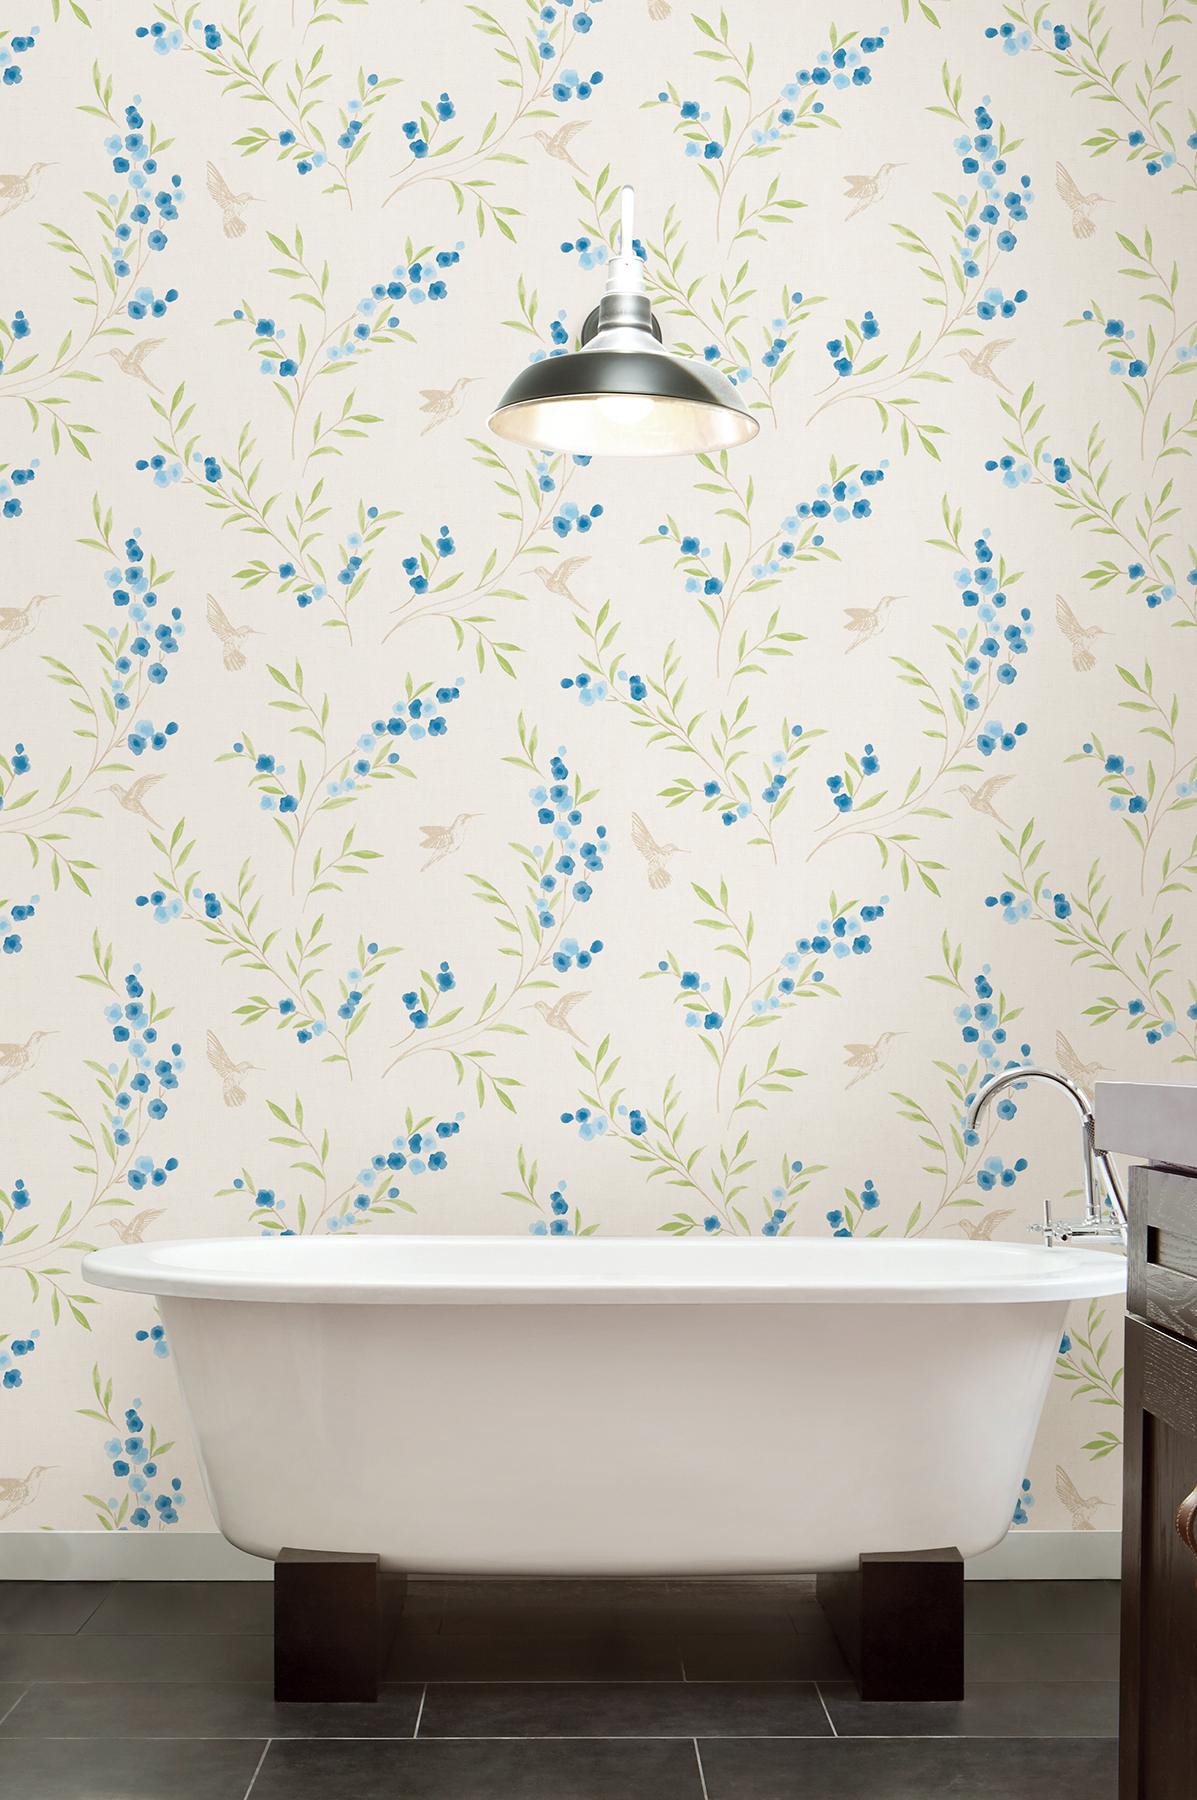 blue floral bathroom wallpaper